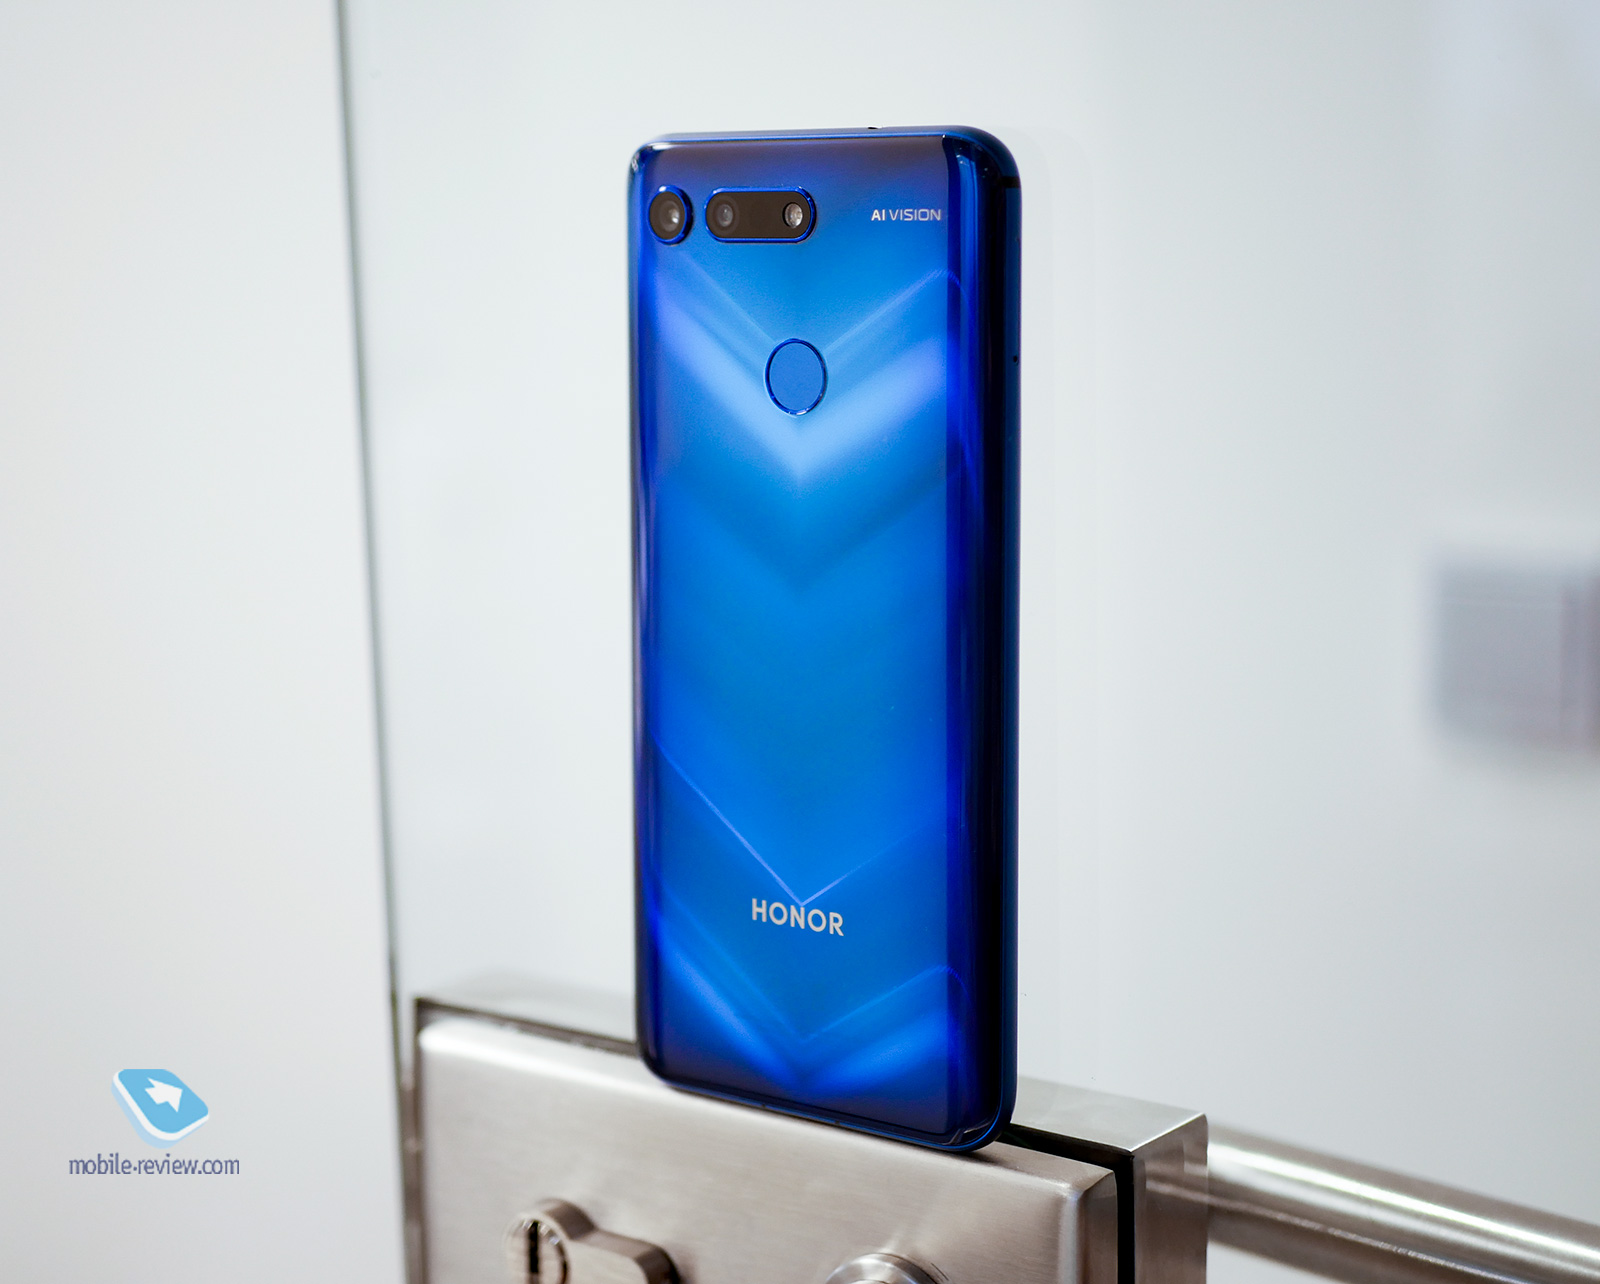 Mobile-review.com Первый взгляд на Honor View 20